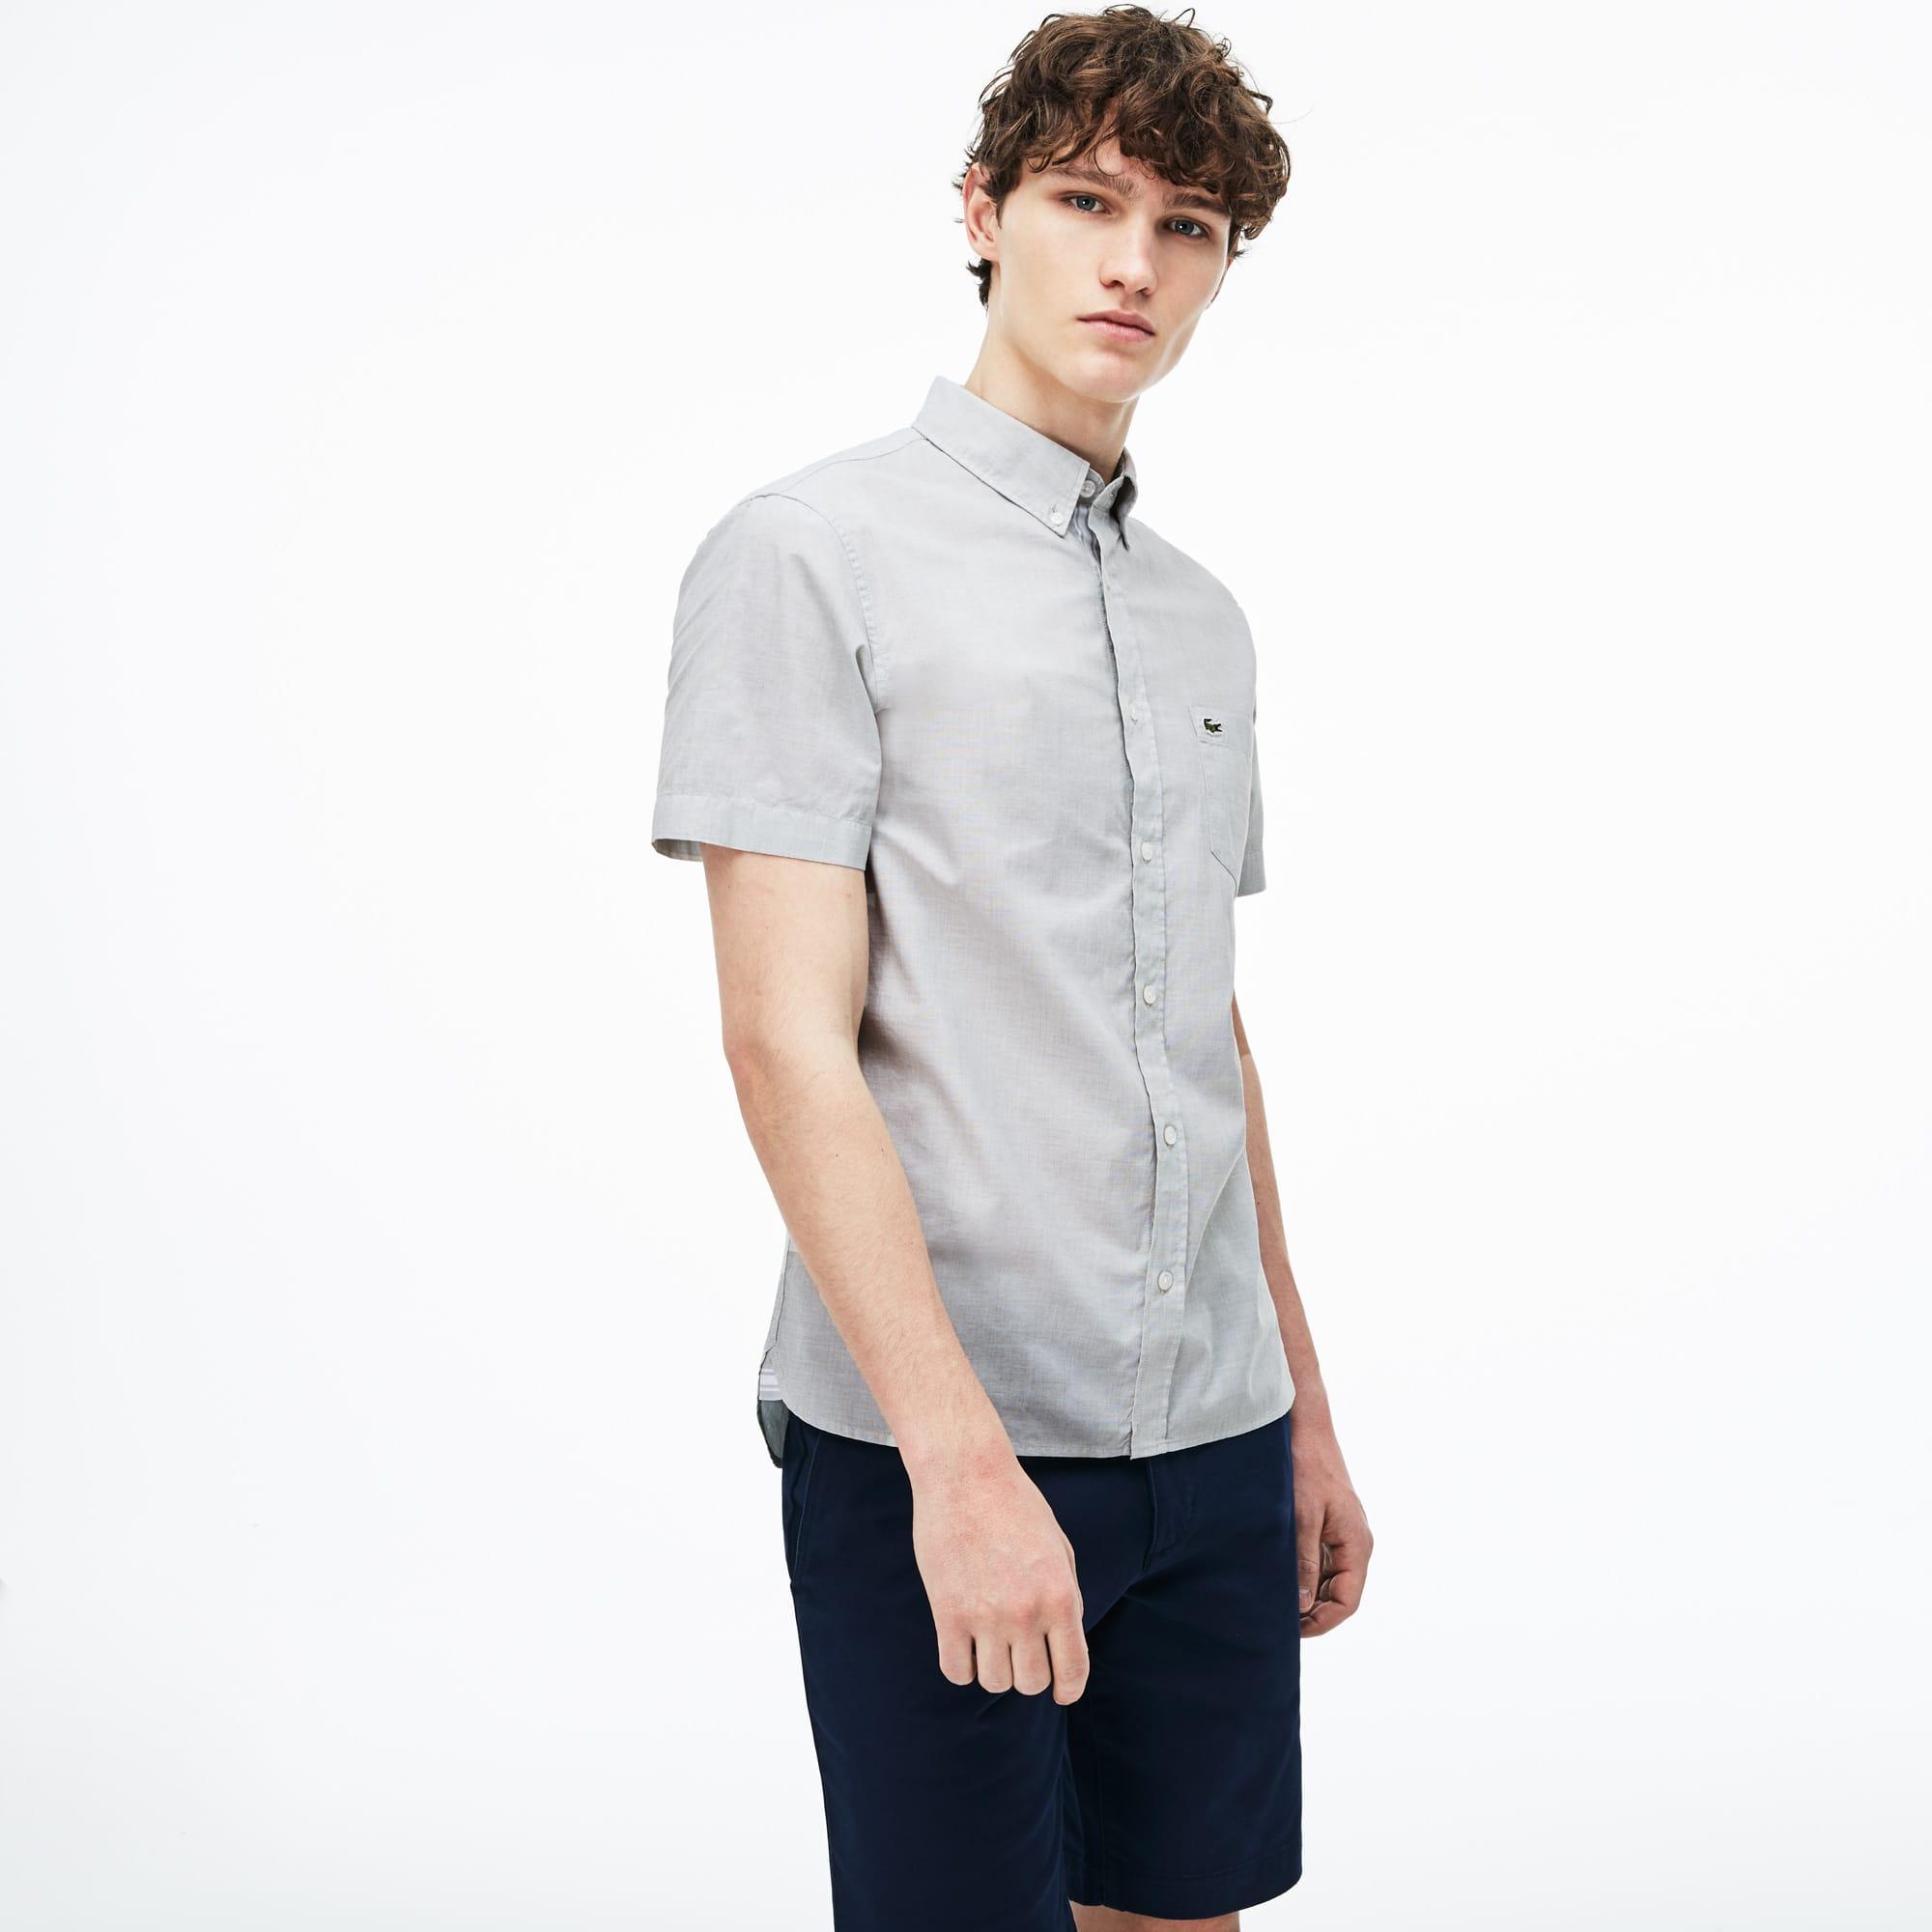 Men's Slim Fit Salt-And-Pepper Cotton Shirt